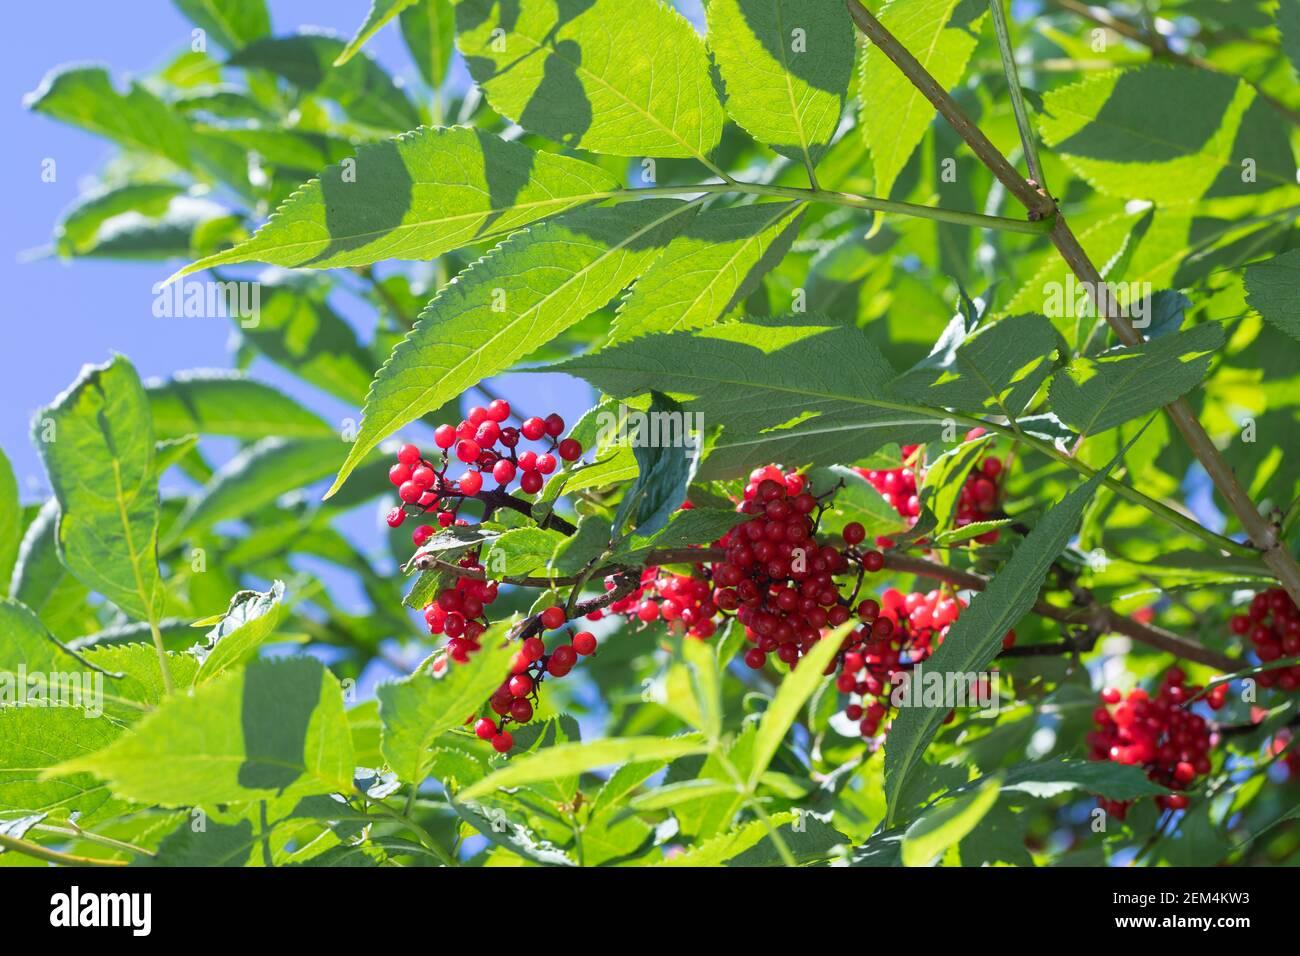 Roter Holunder, Trauben-Holunder, Traubenholunder, Bergholunder, Berg-Holunder, Reife Früchte, Sambucus racemosa, Elder rouge, Elderberry rouge, f Banque D'Images